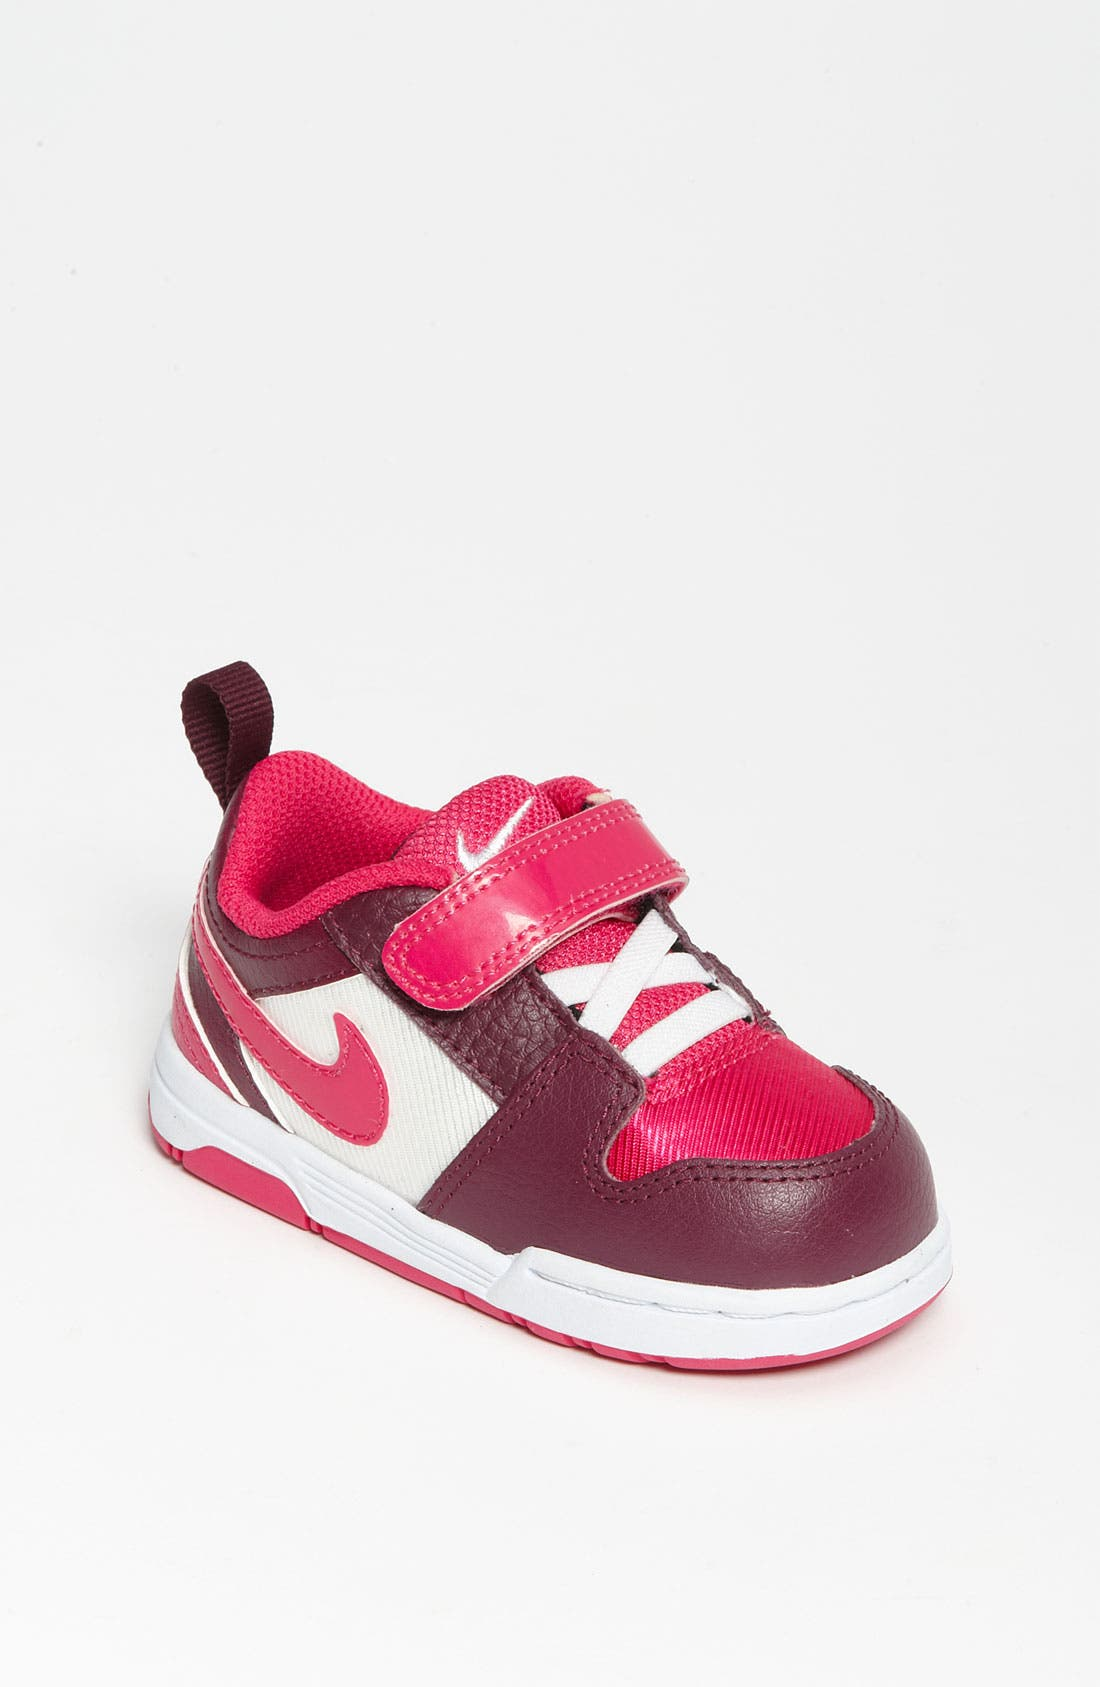 Main Image - Nike 'Mogan 3' Sneaker (Walker & Toddler)